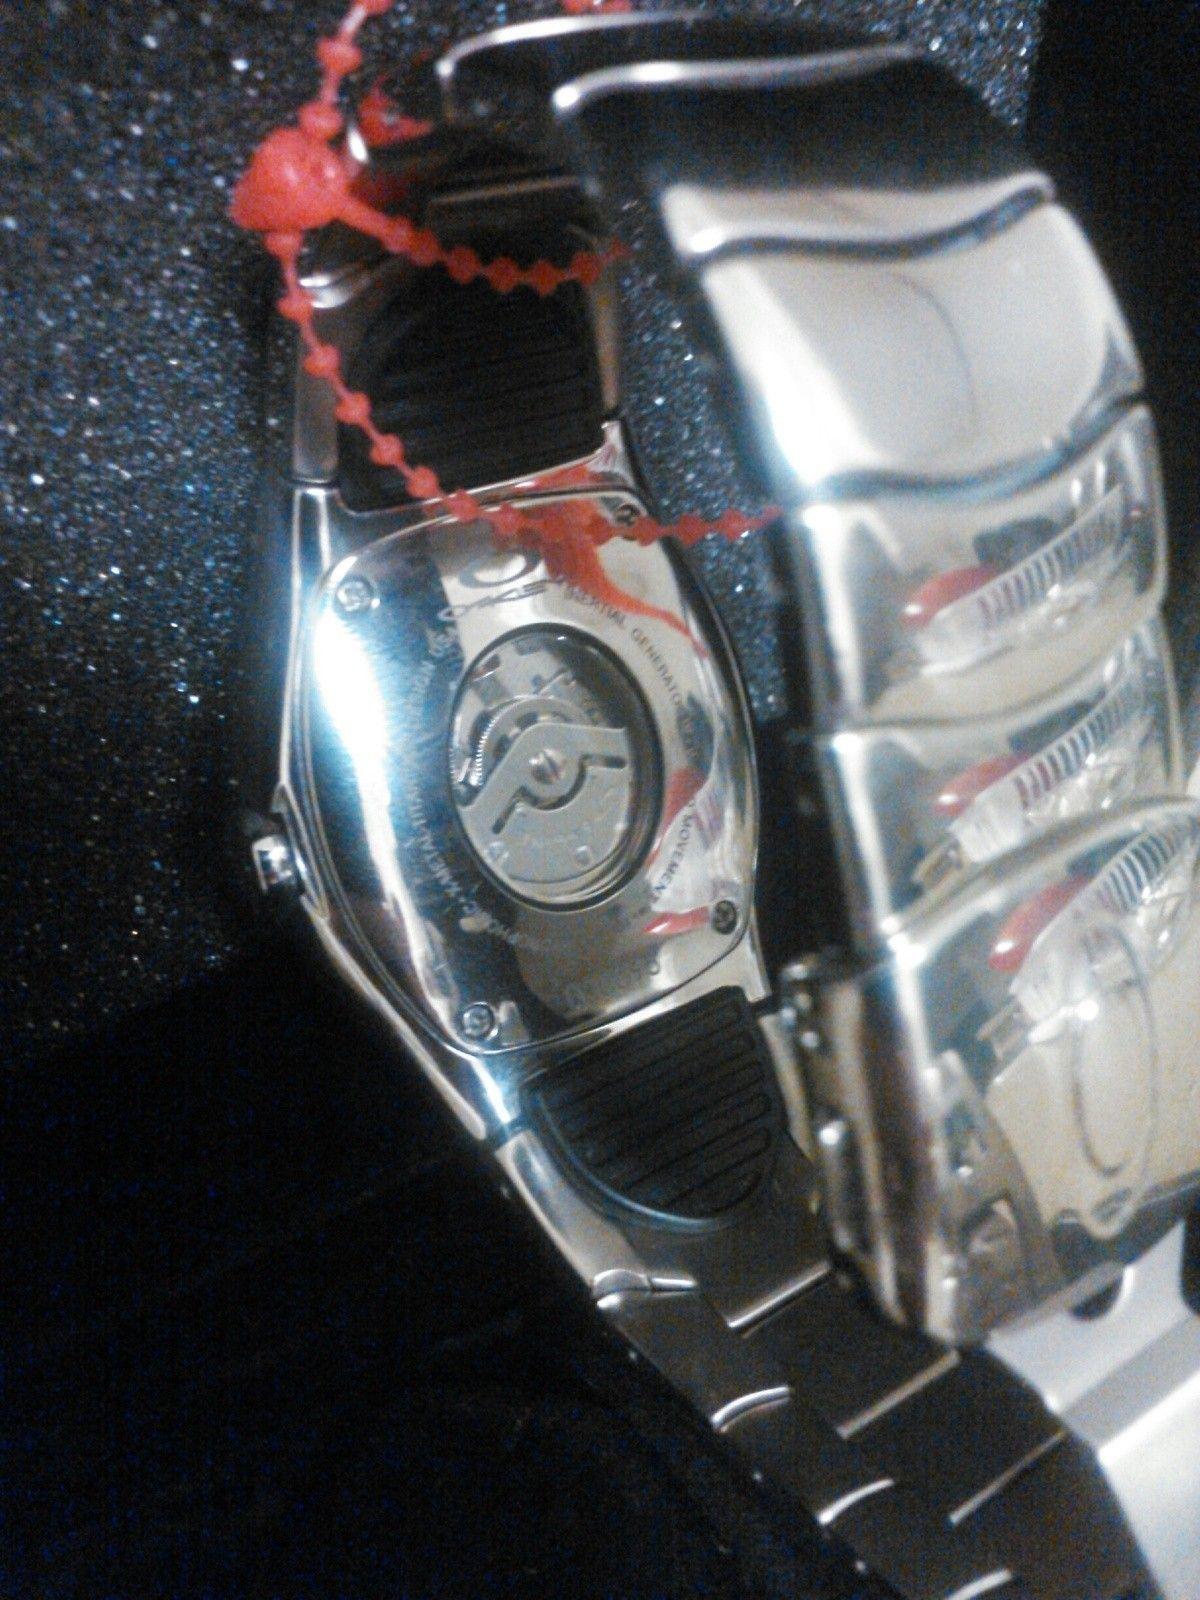 Hydrophobic watch - NCM_0010.jpg